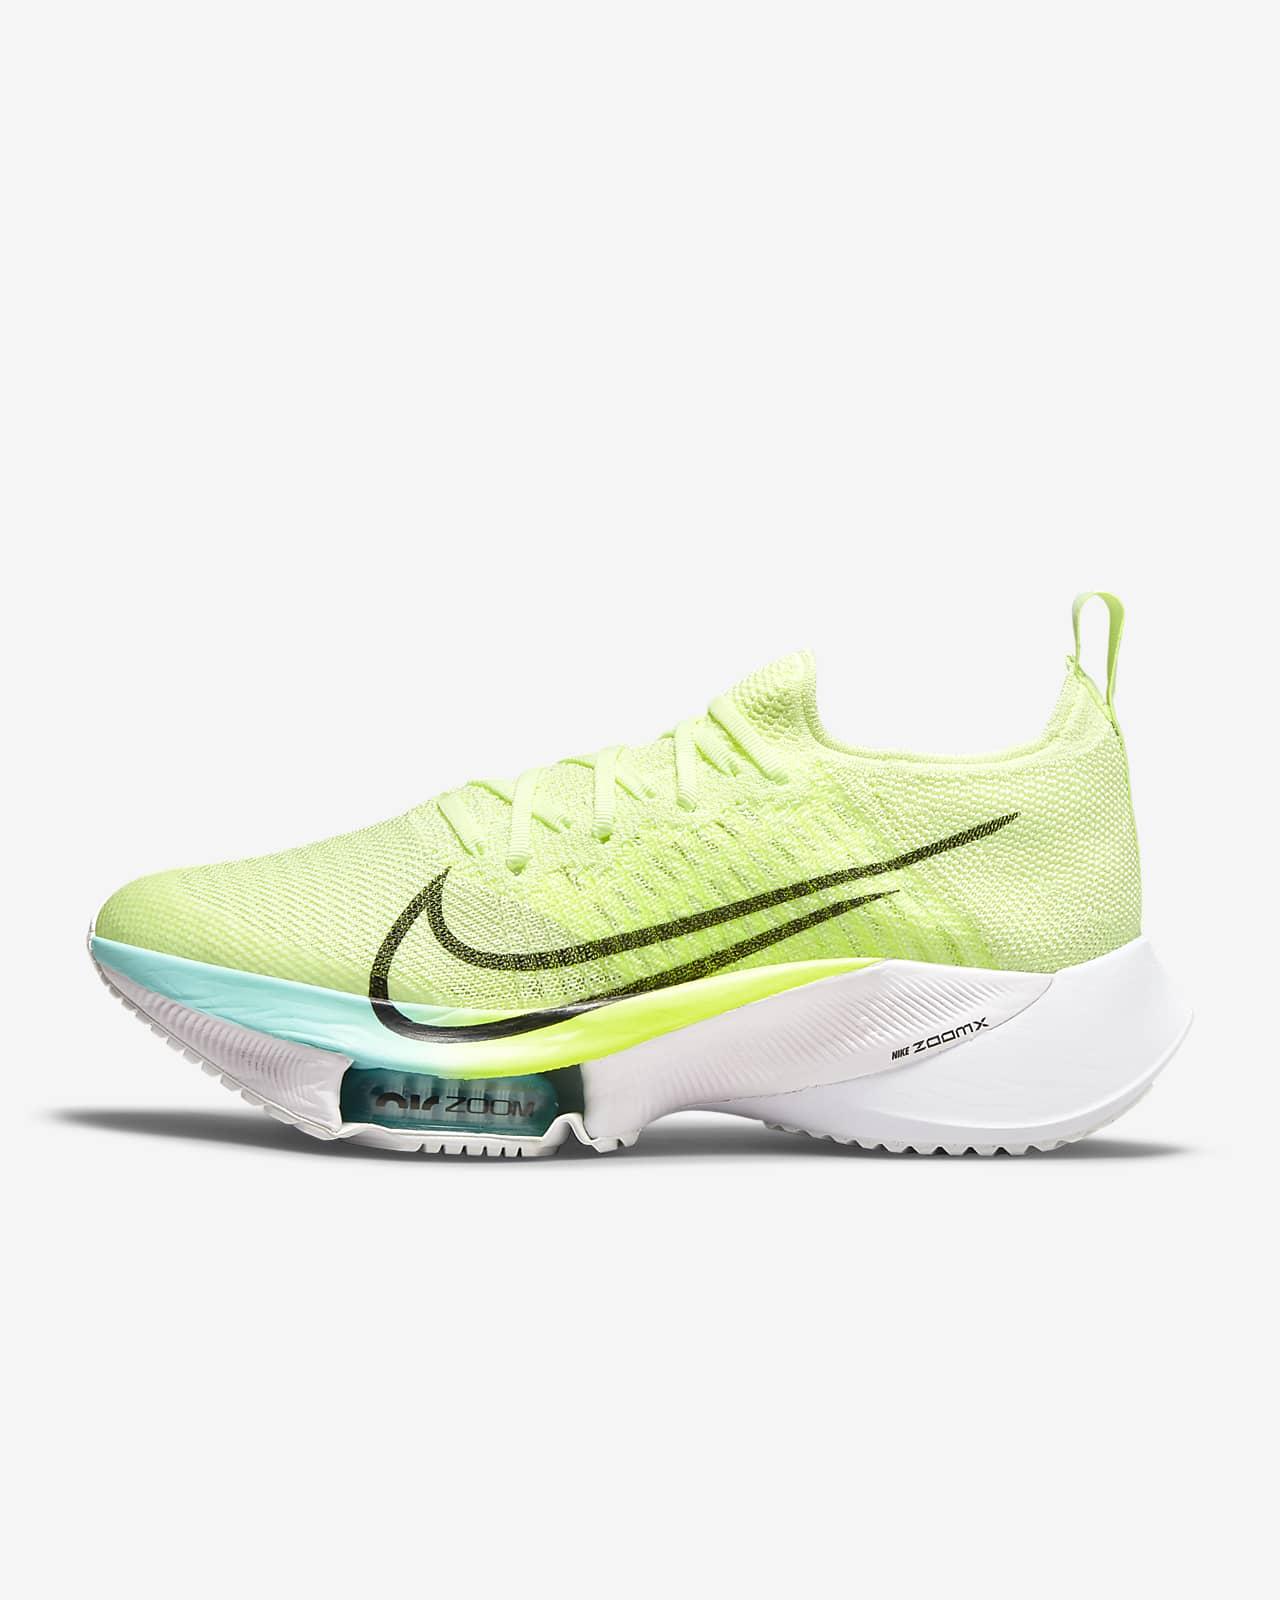 Женские беговые кроссовки Nike Air Zoom Tempo NEXT%